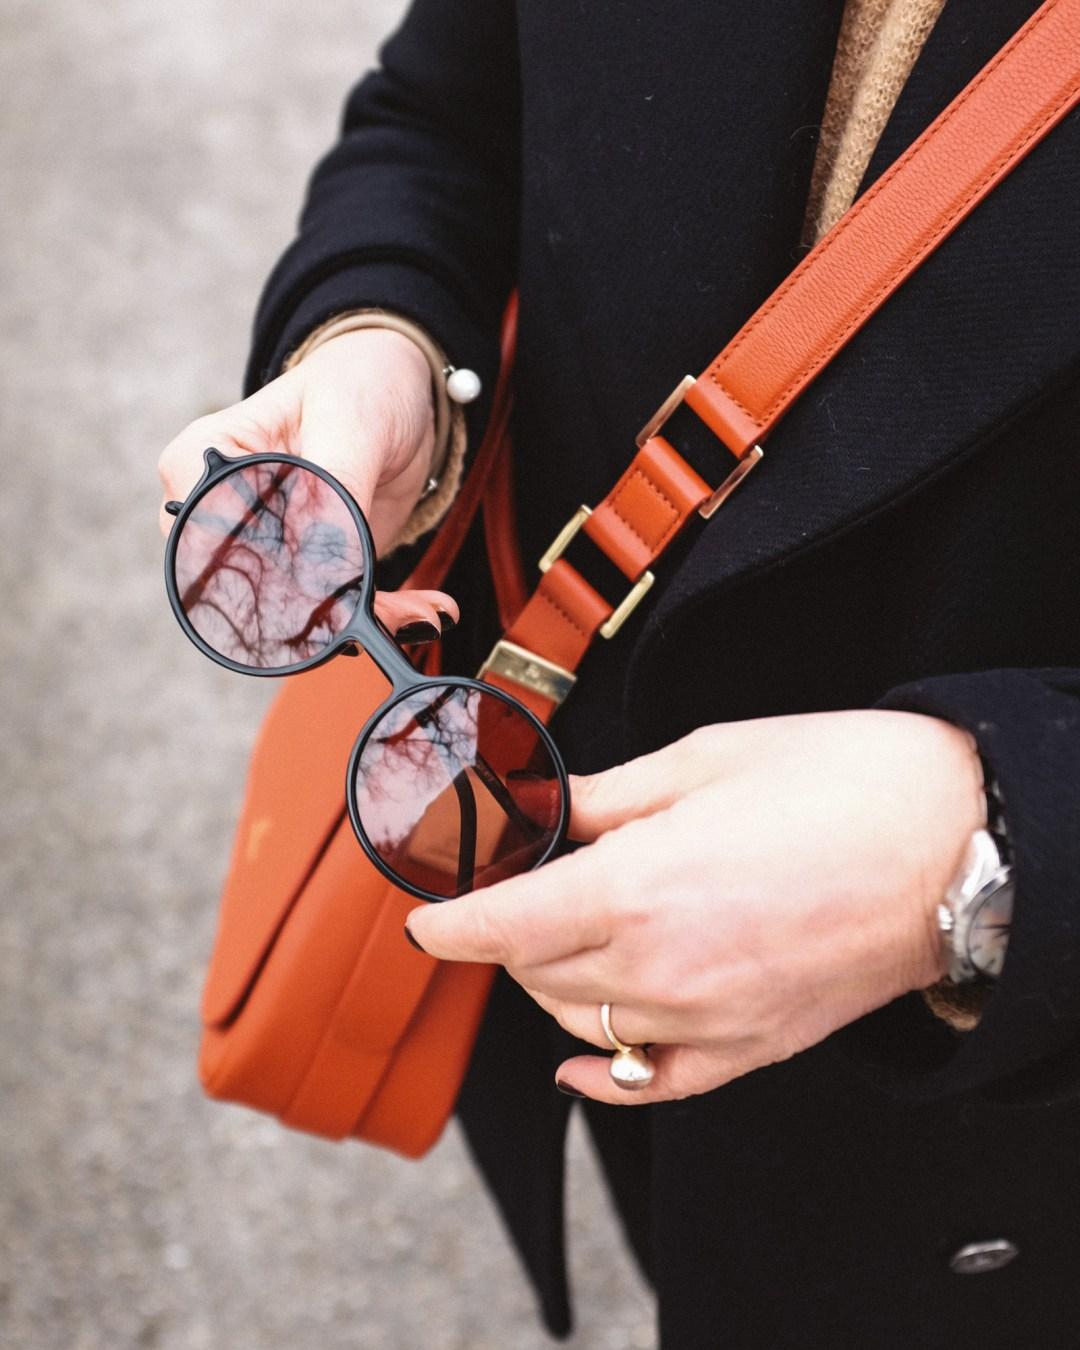 inastil, Ü50Blogger, Modeberatung, Stilberatung, Ü50Mode, Styleover50, Cabanjacke, Aignertasche, weisse Sneaker, Casualstyle, Streetstyle-9